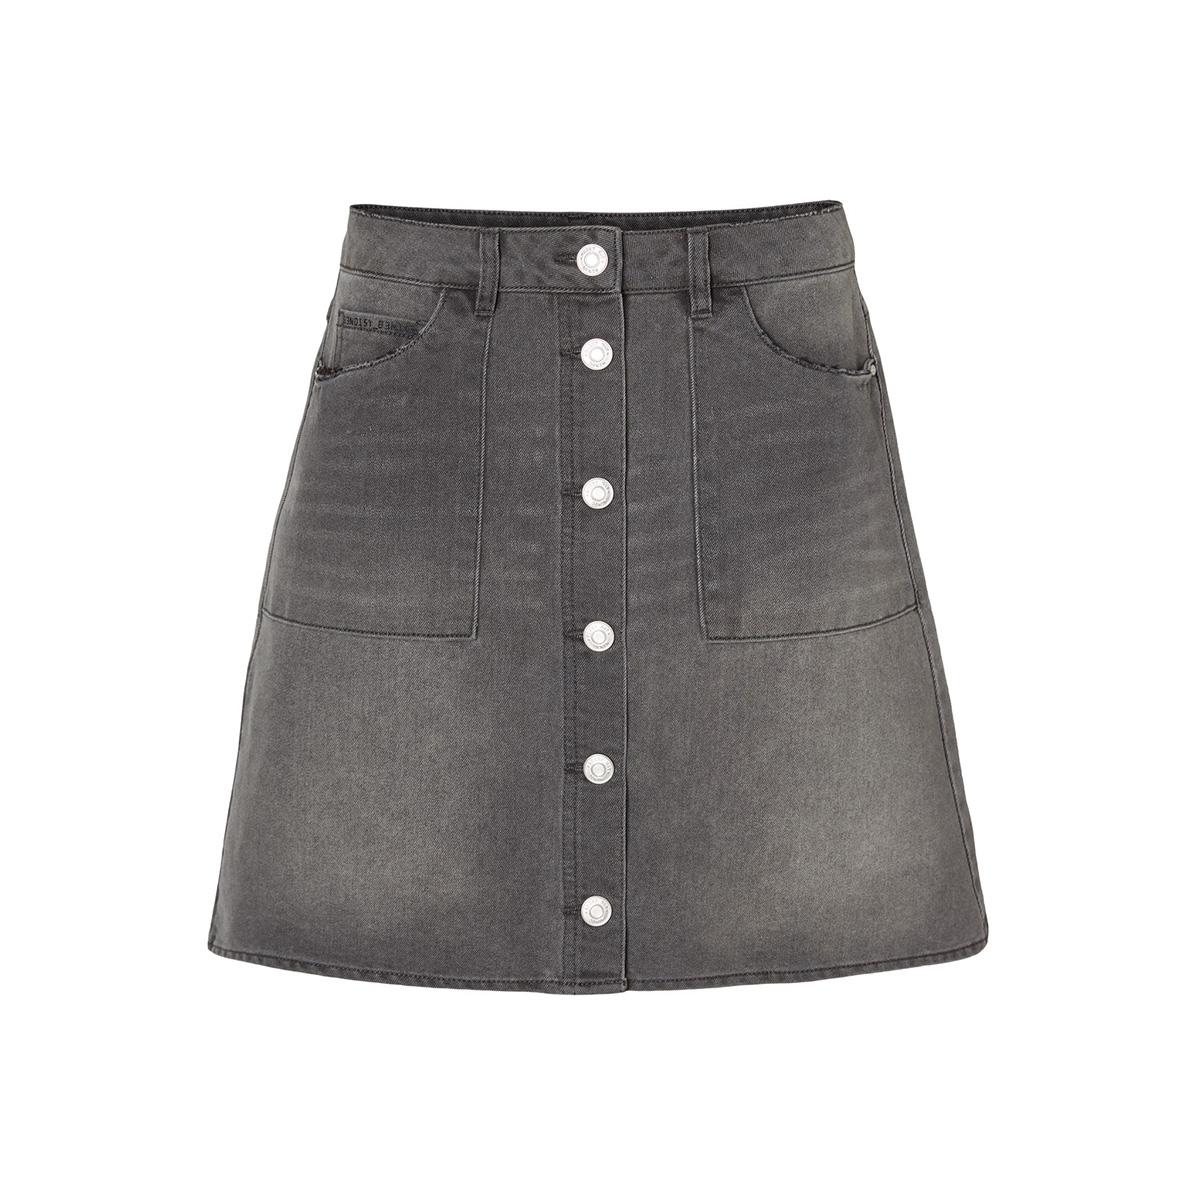 nmdebbie nw short dnm skirt jt070dg 27009772 noisy may rok dark grey denim